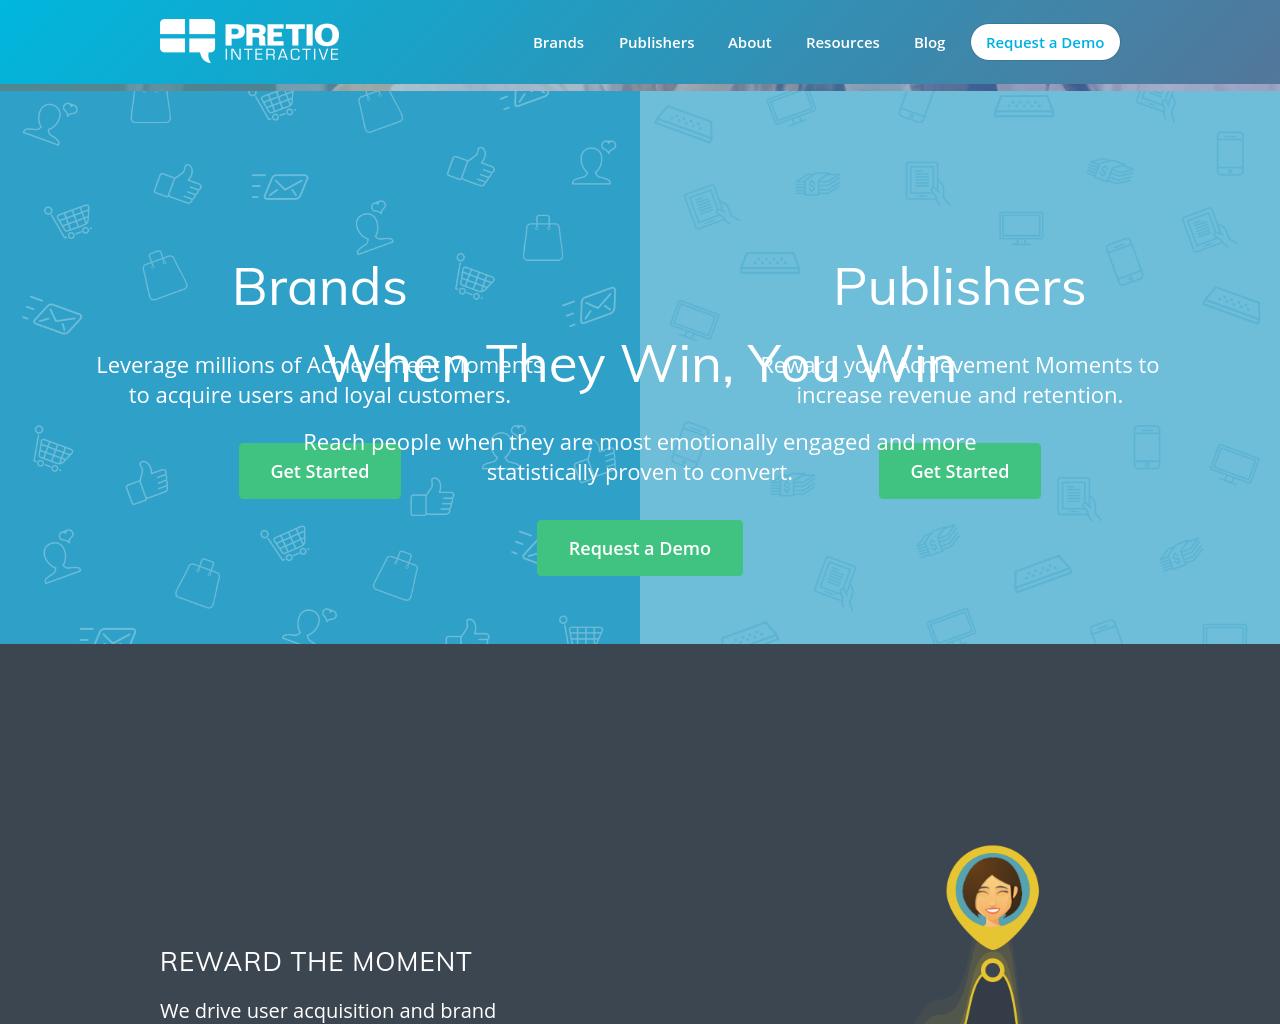 PRETIO-INTERACTIVE-Advertising-Reviews-Pricing